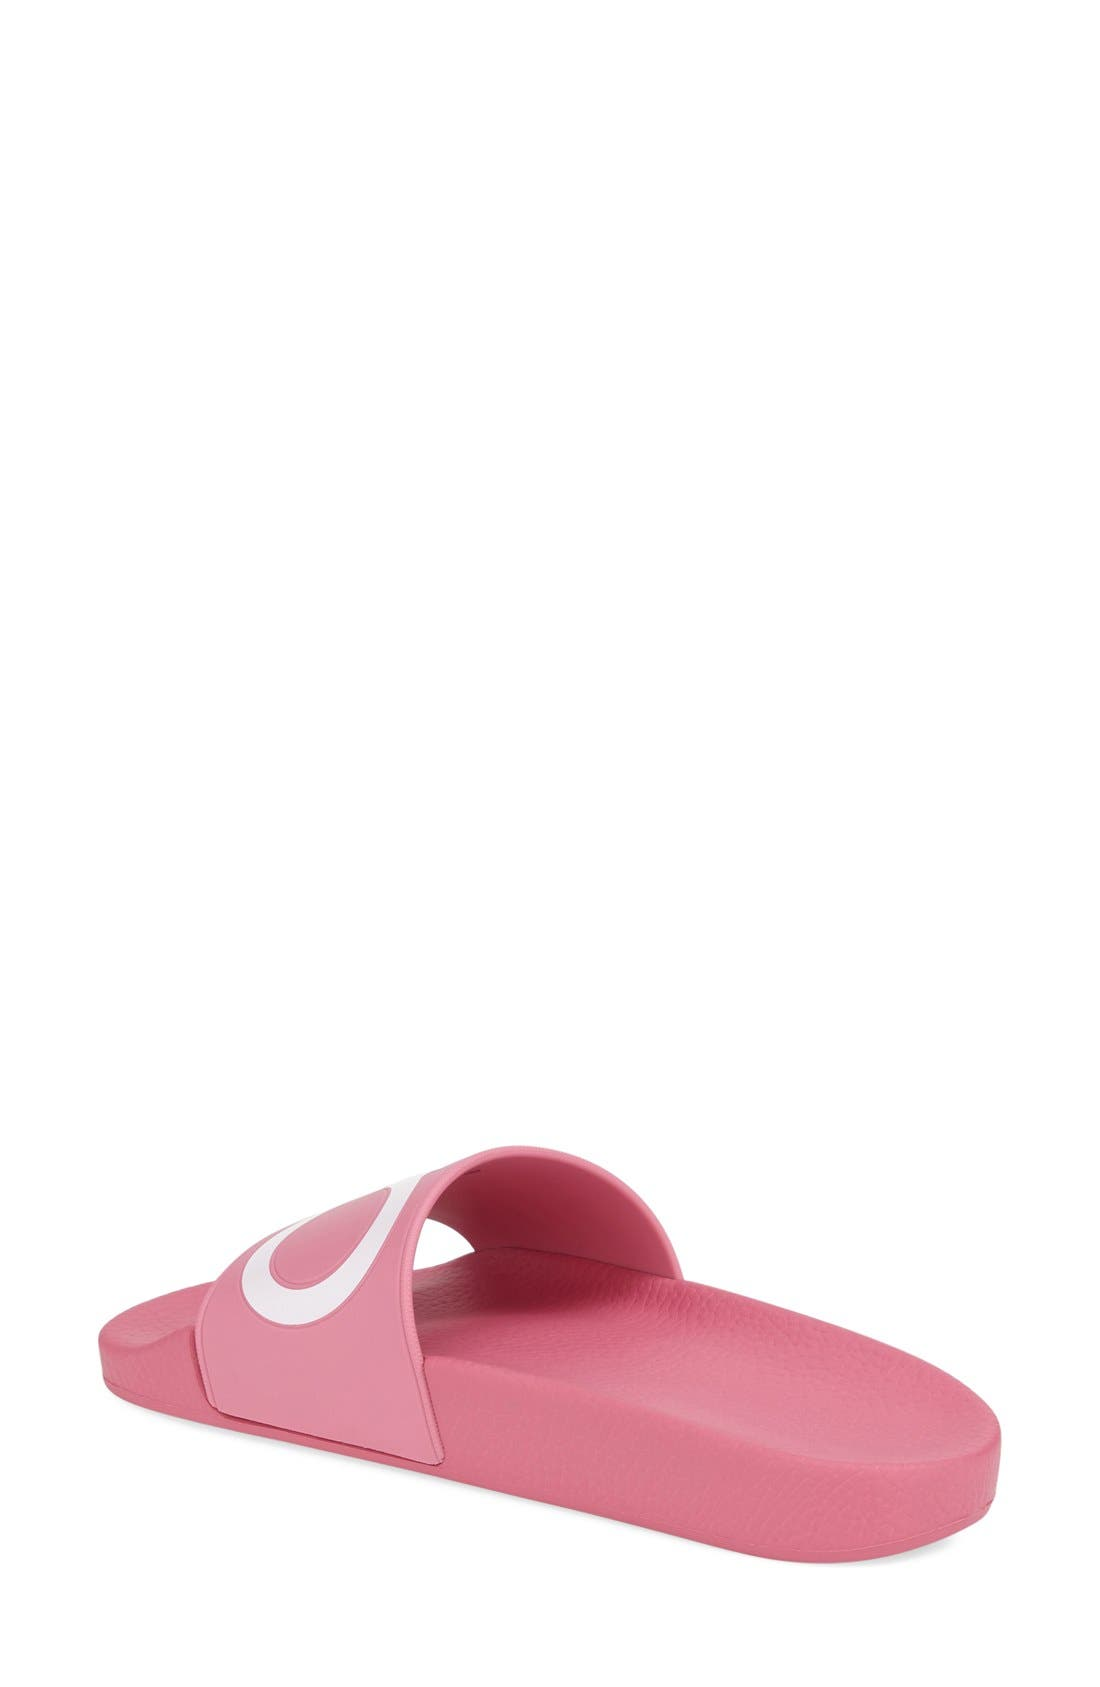 Groove Logo Slide Sandal,                             Alternate thumbnail 2, color,                             Bubble Gum Pink/ White